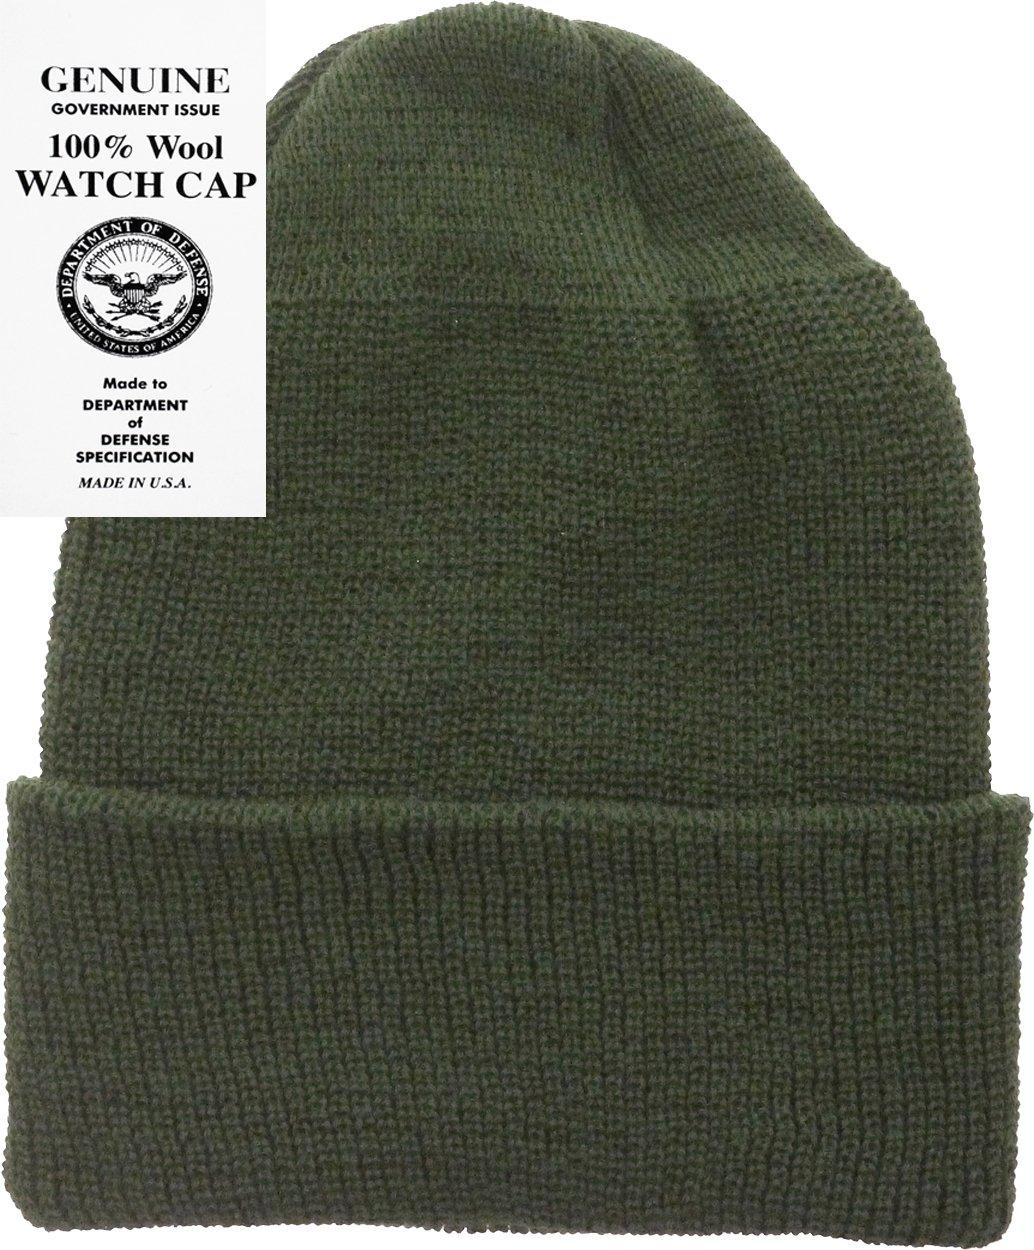 Military Genuine GI Winter USN Warm Wool Hat Watch Cap (Olive Drab)